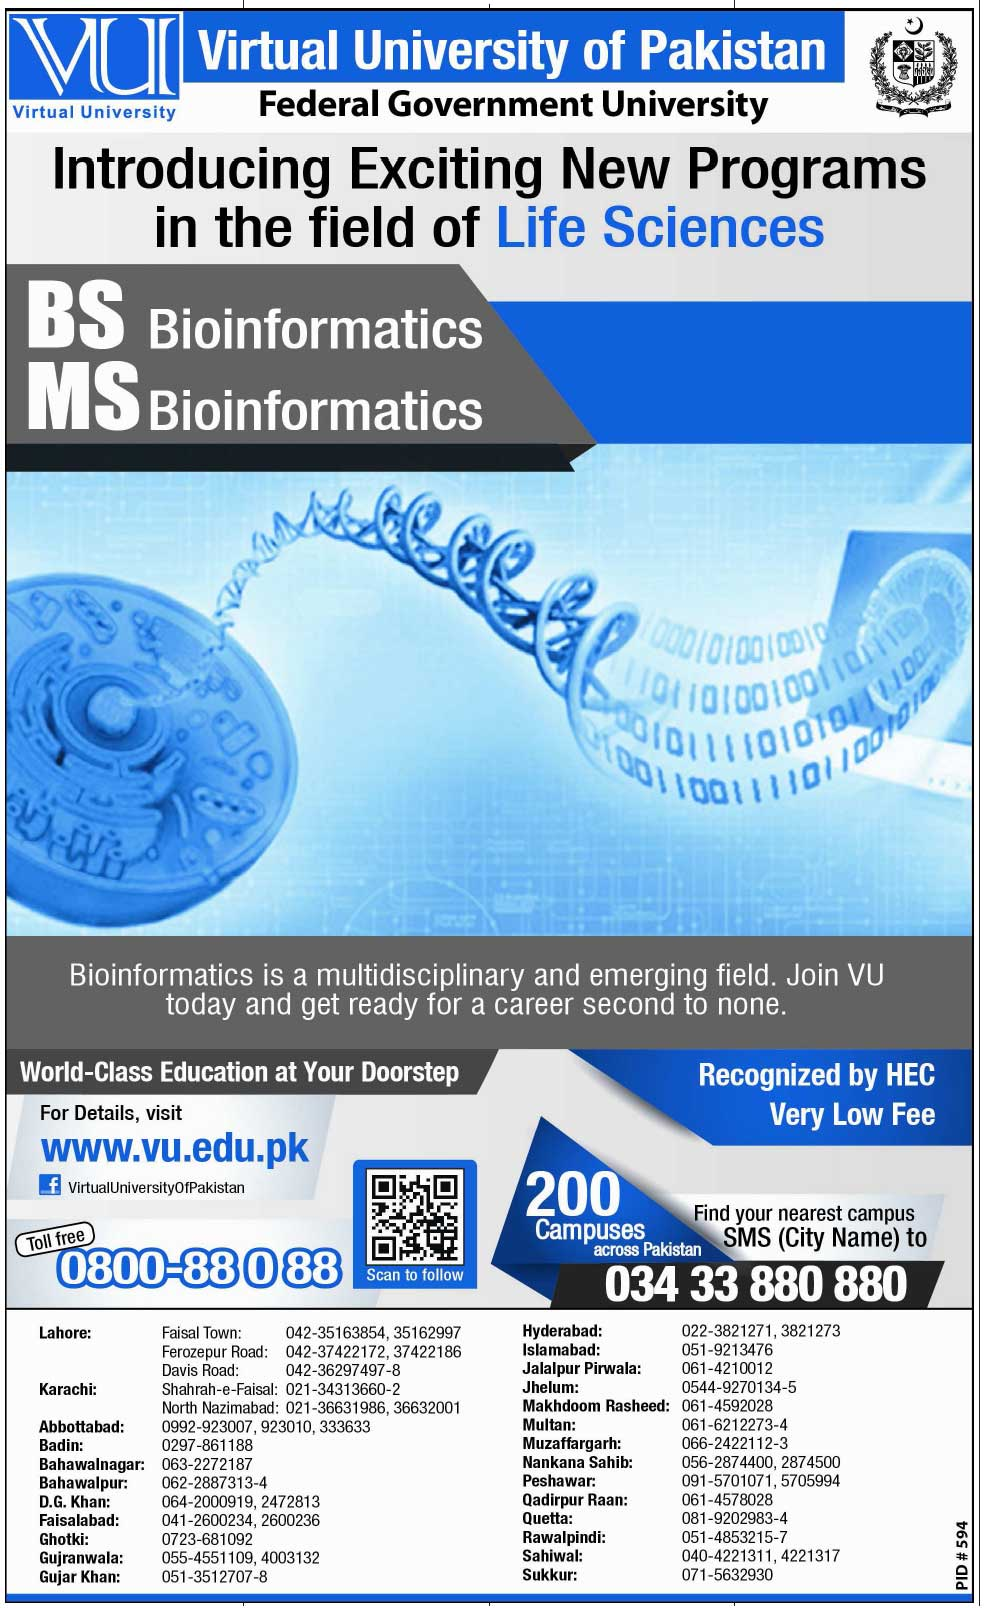 Virtual University of Pakistan (VU) Lahore Admission Notice 2014-2015 for BS Bioinformatics, MS Bioinformatics